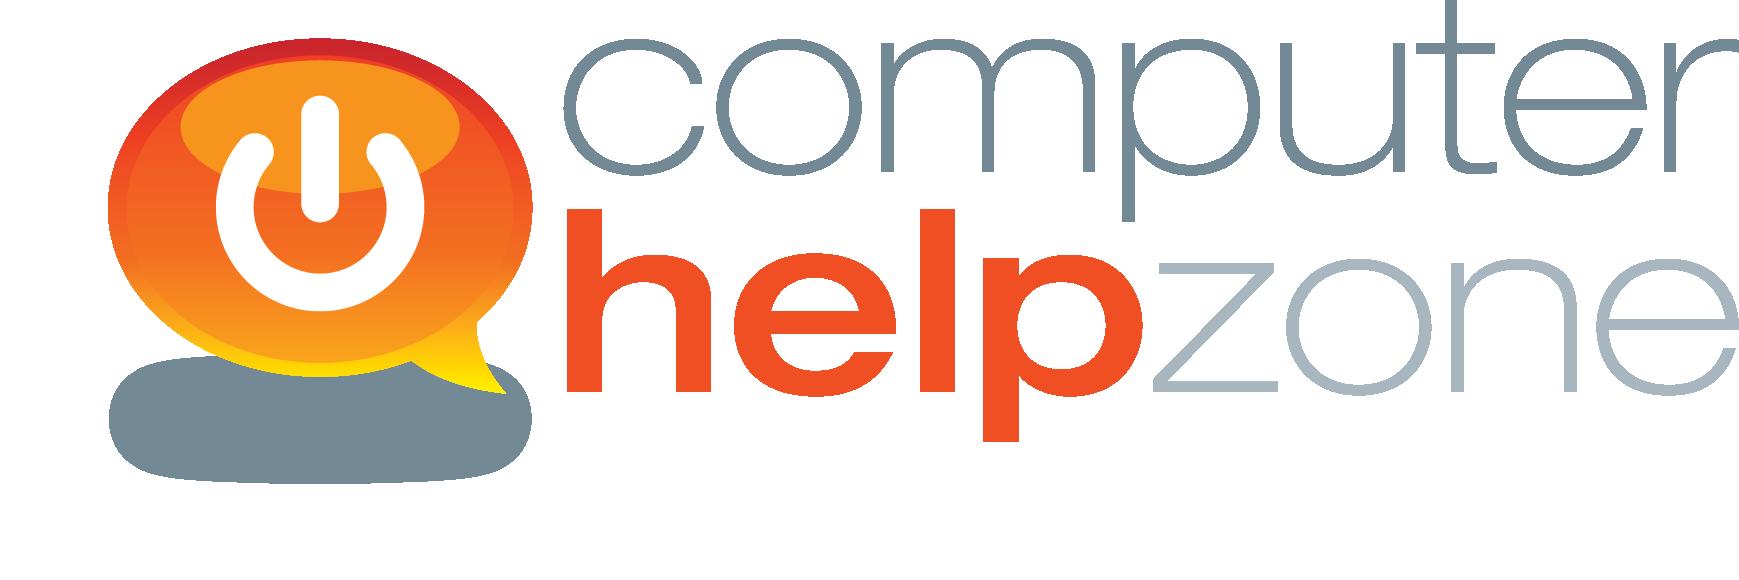 Computer Help Zone